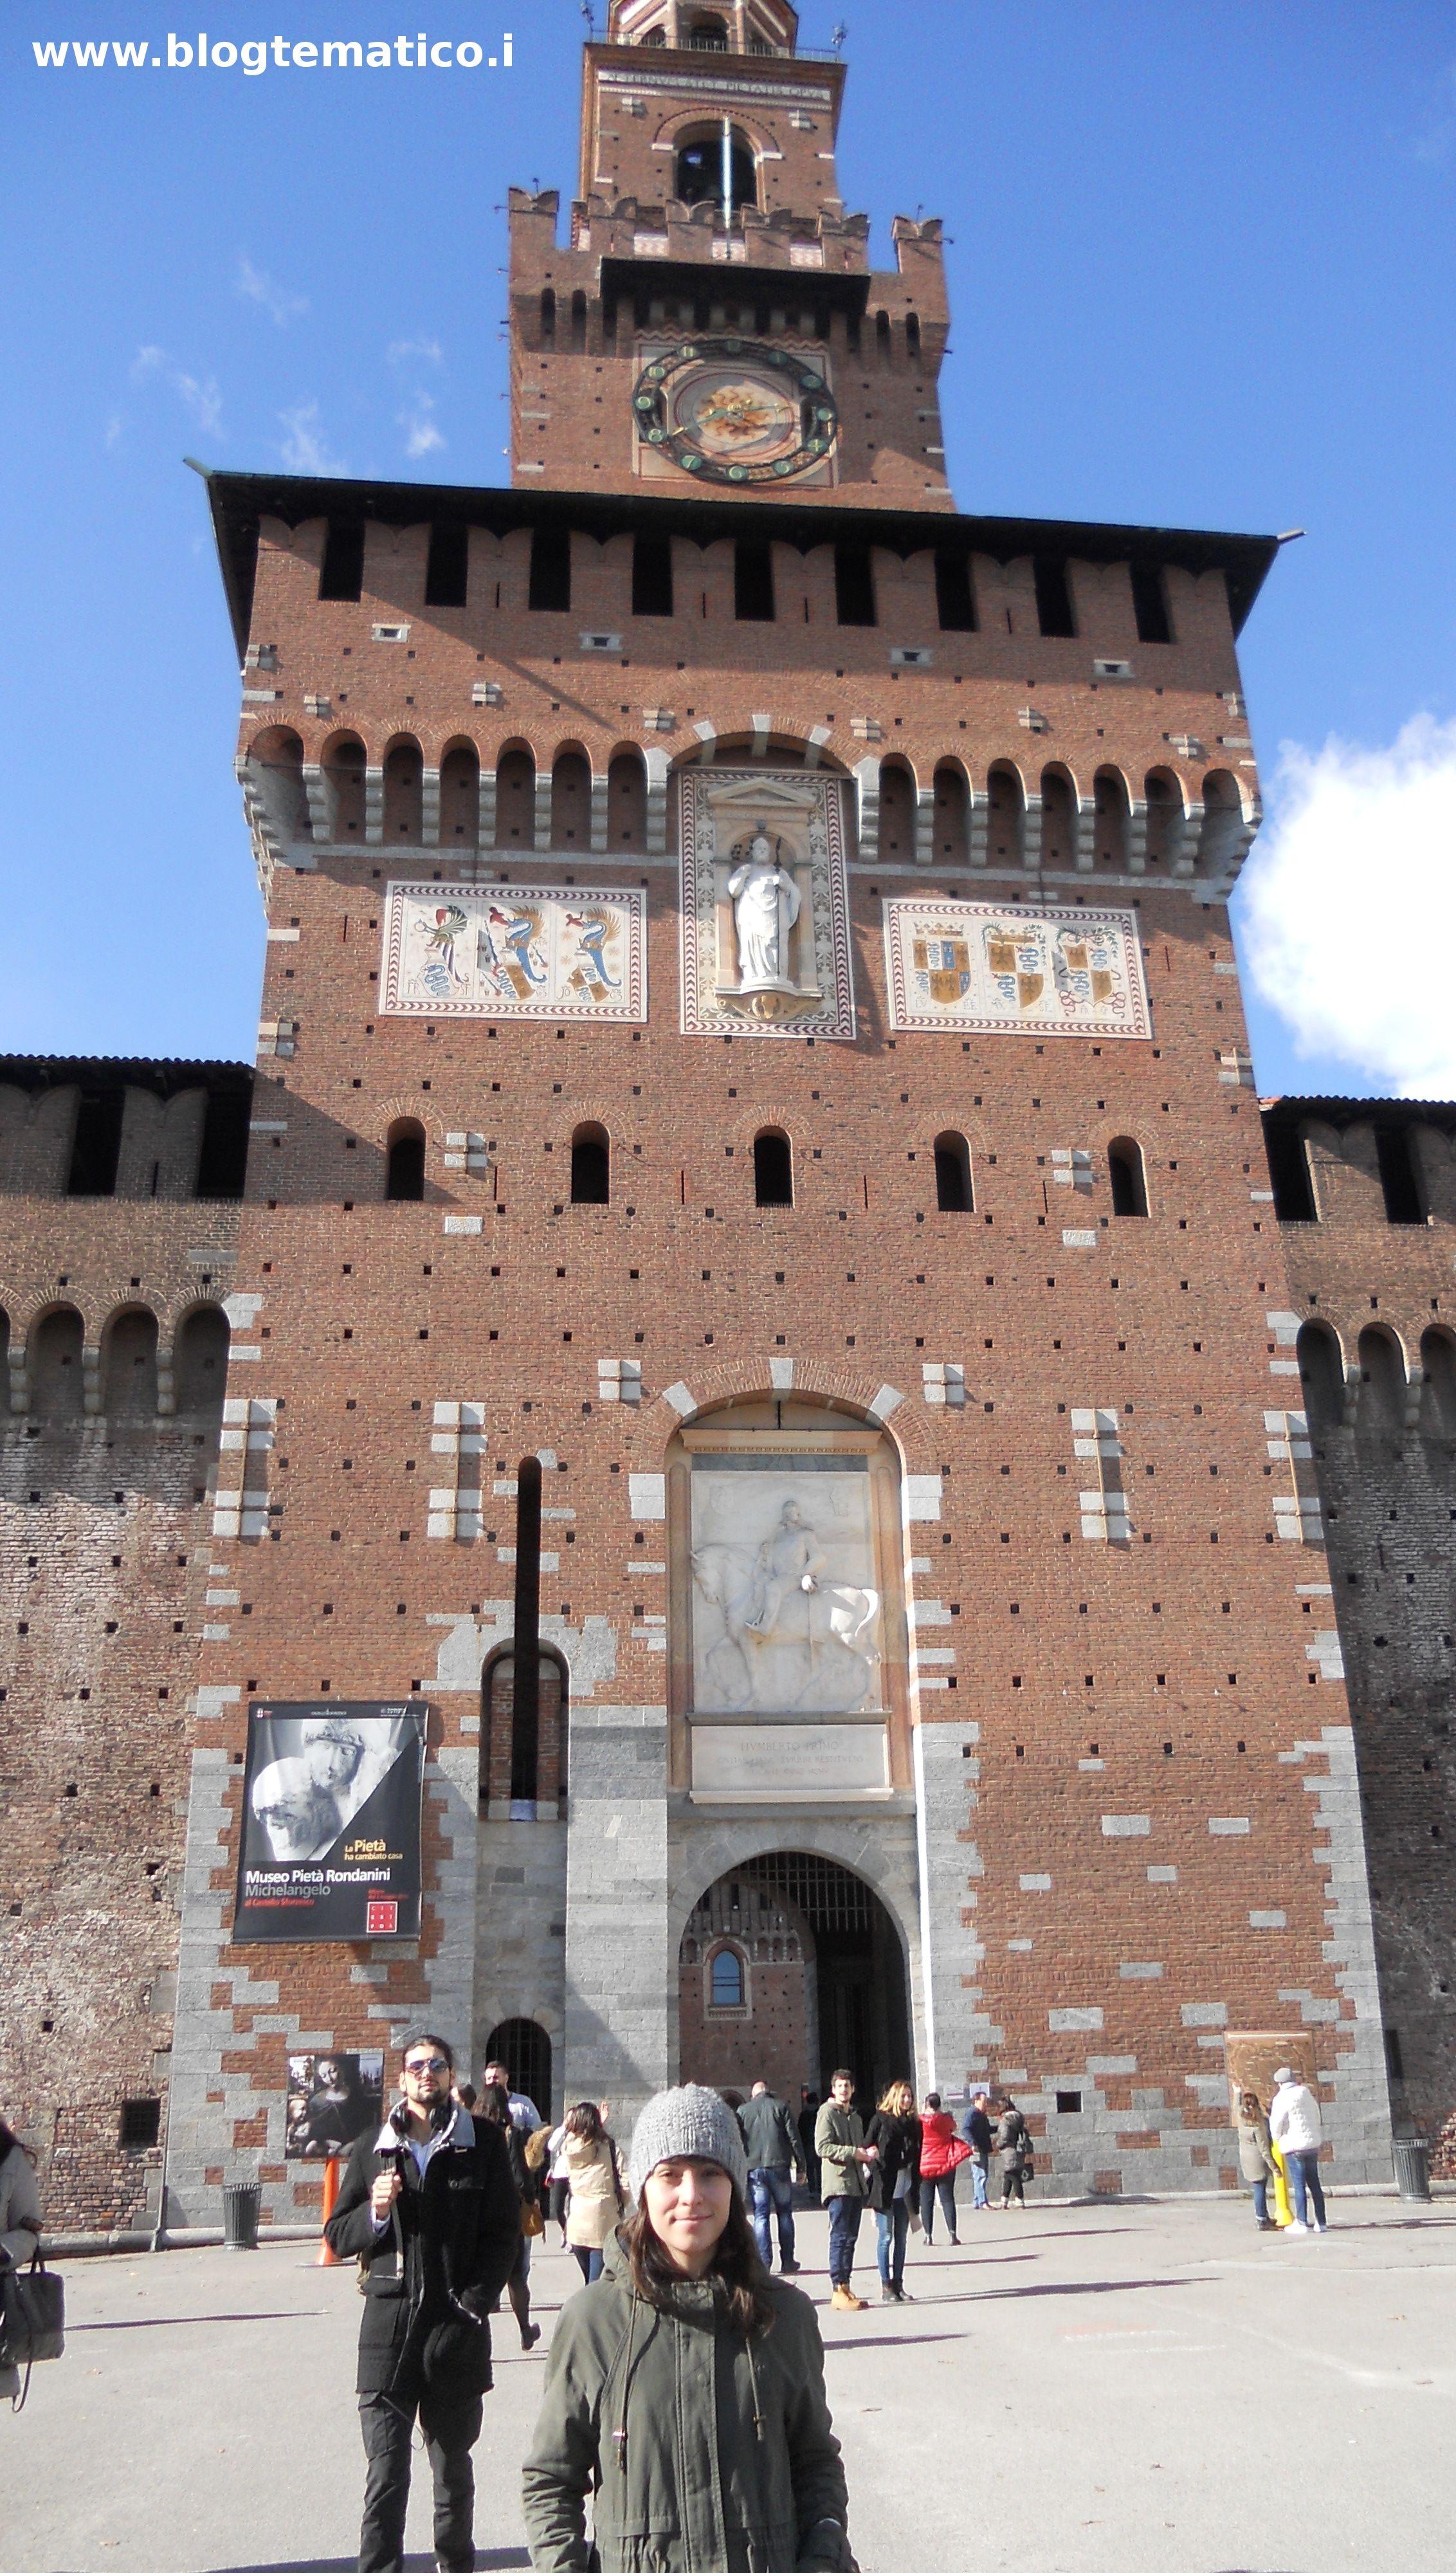 Milano:mia figlia Claudia davanti al Castello Sforzesco- _______________________ -ITALIA by Francesco -Welcome and enjoy- #WonderfulExpo2015 #Wonderfooditaly #MadeinItaly #slowfood #FrancescoBruno @frbrun http://www.blogtematico.it frbrun@tiscali.it http://www.francoingbruno.it #Basilicata